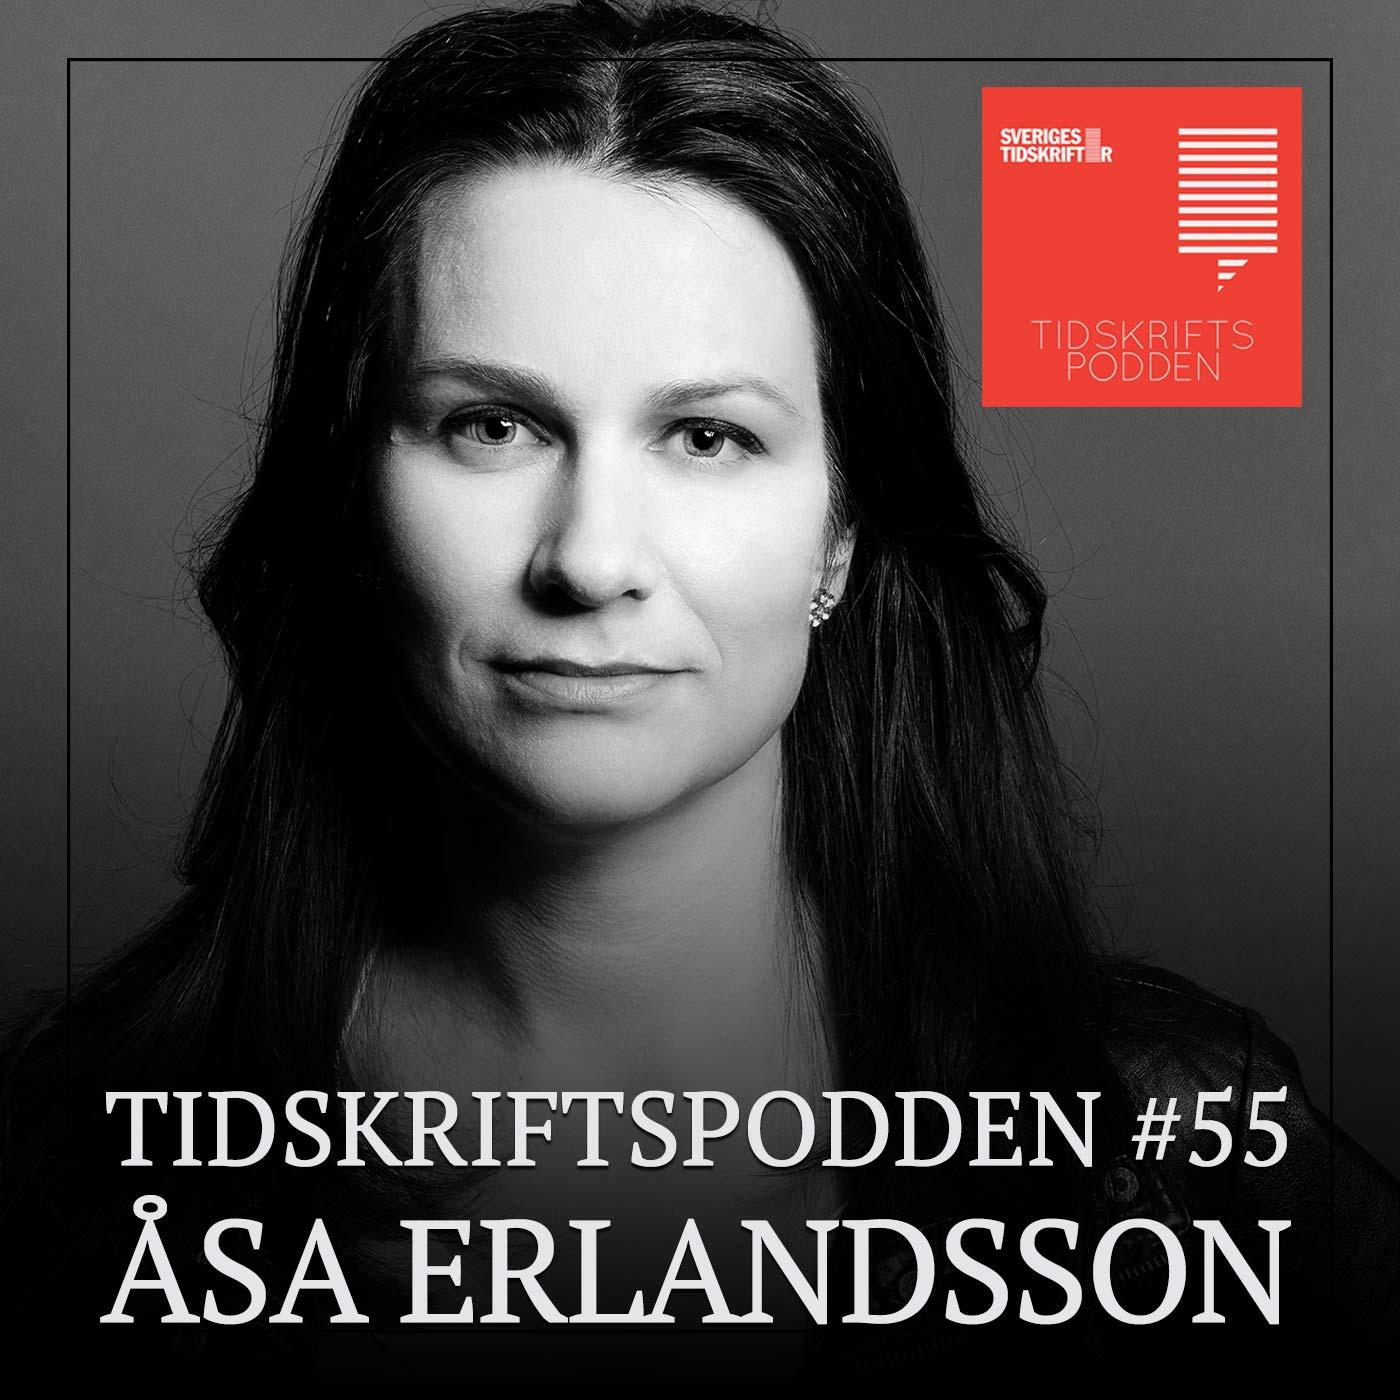 Åsa Erlandsson, Tidskriftspodden